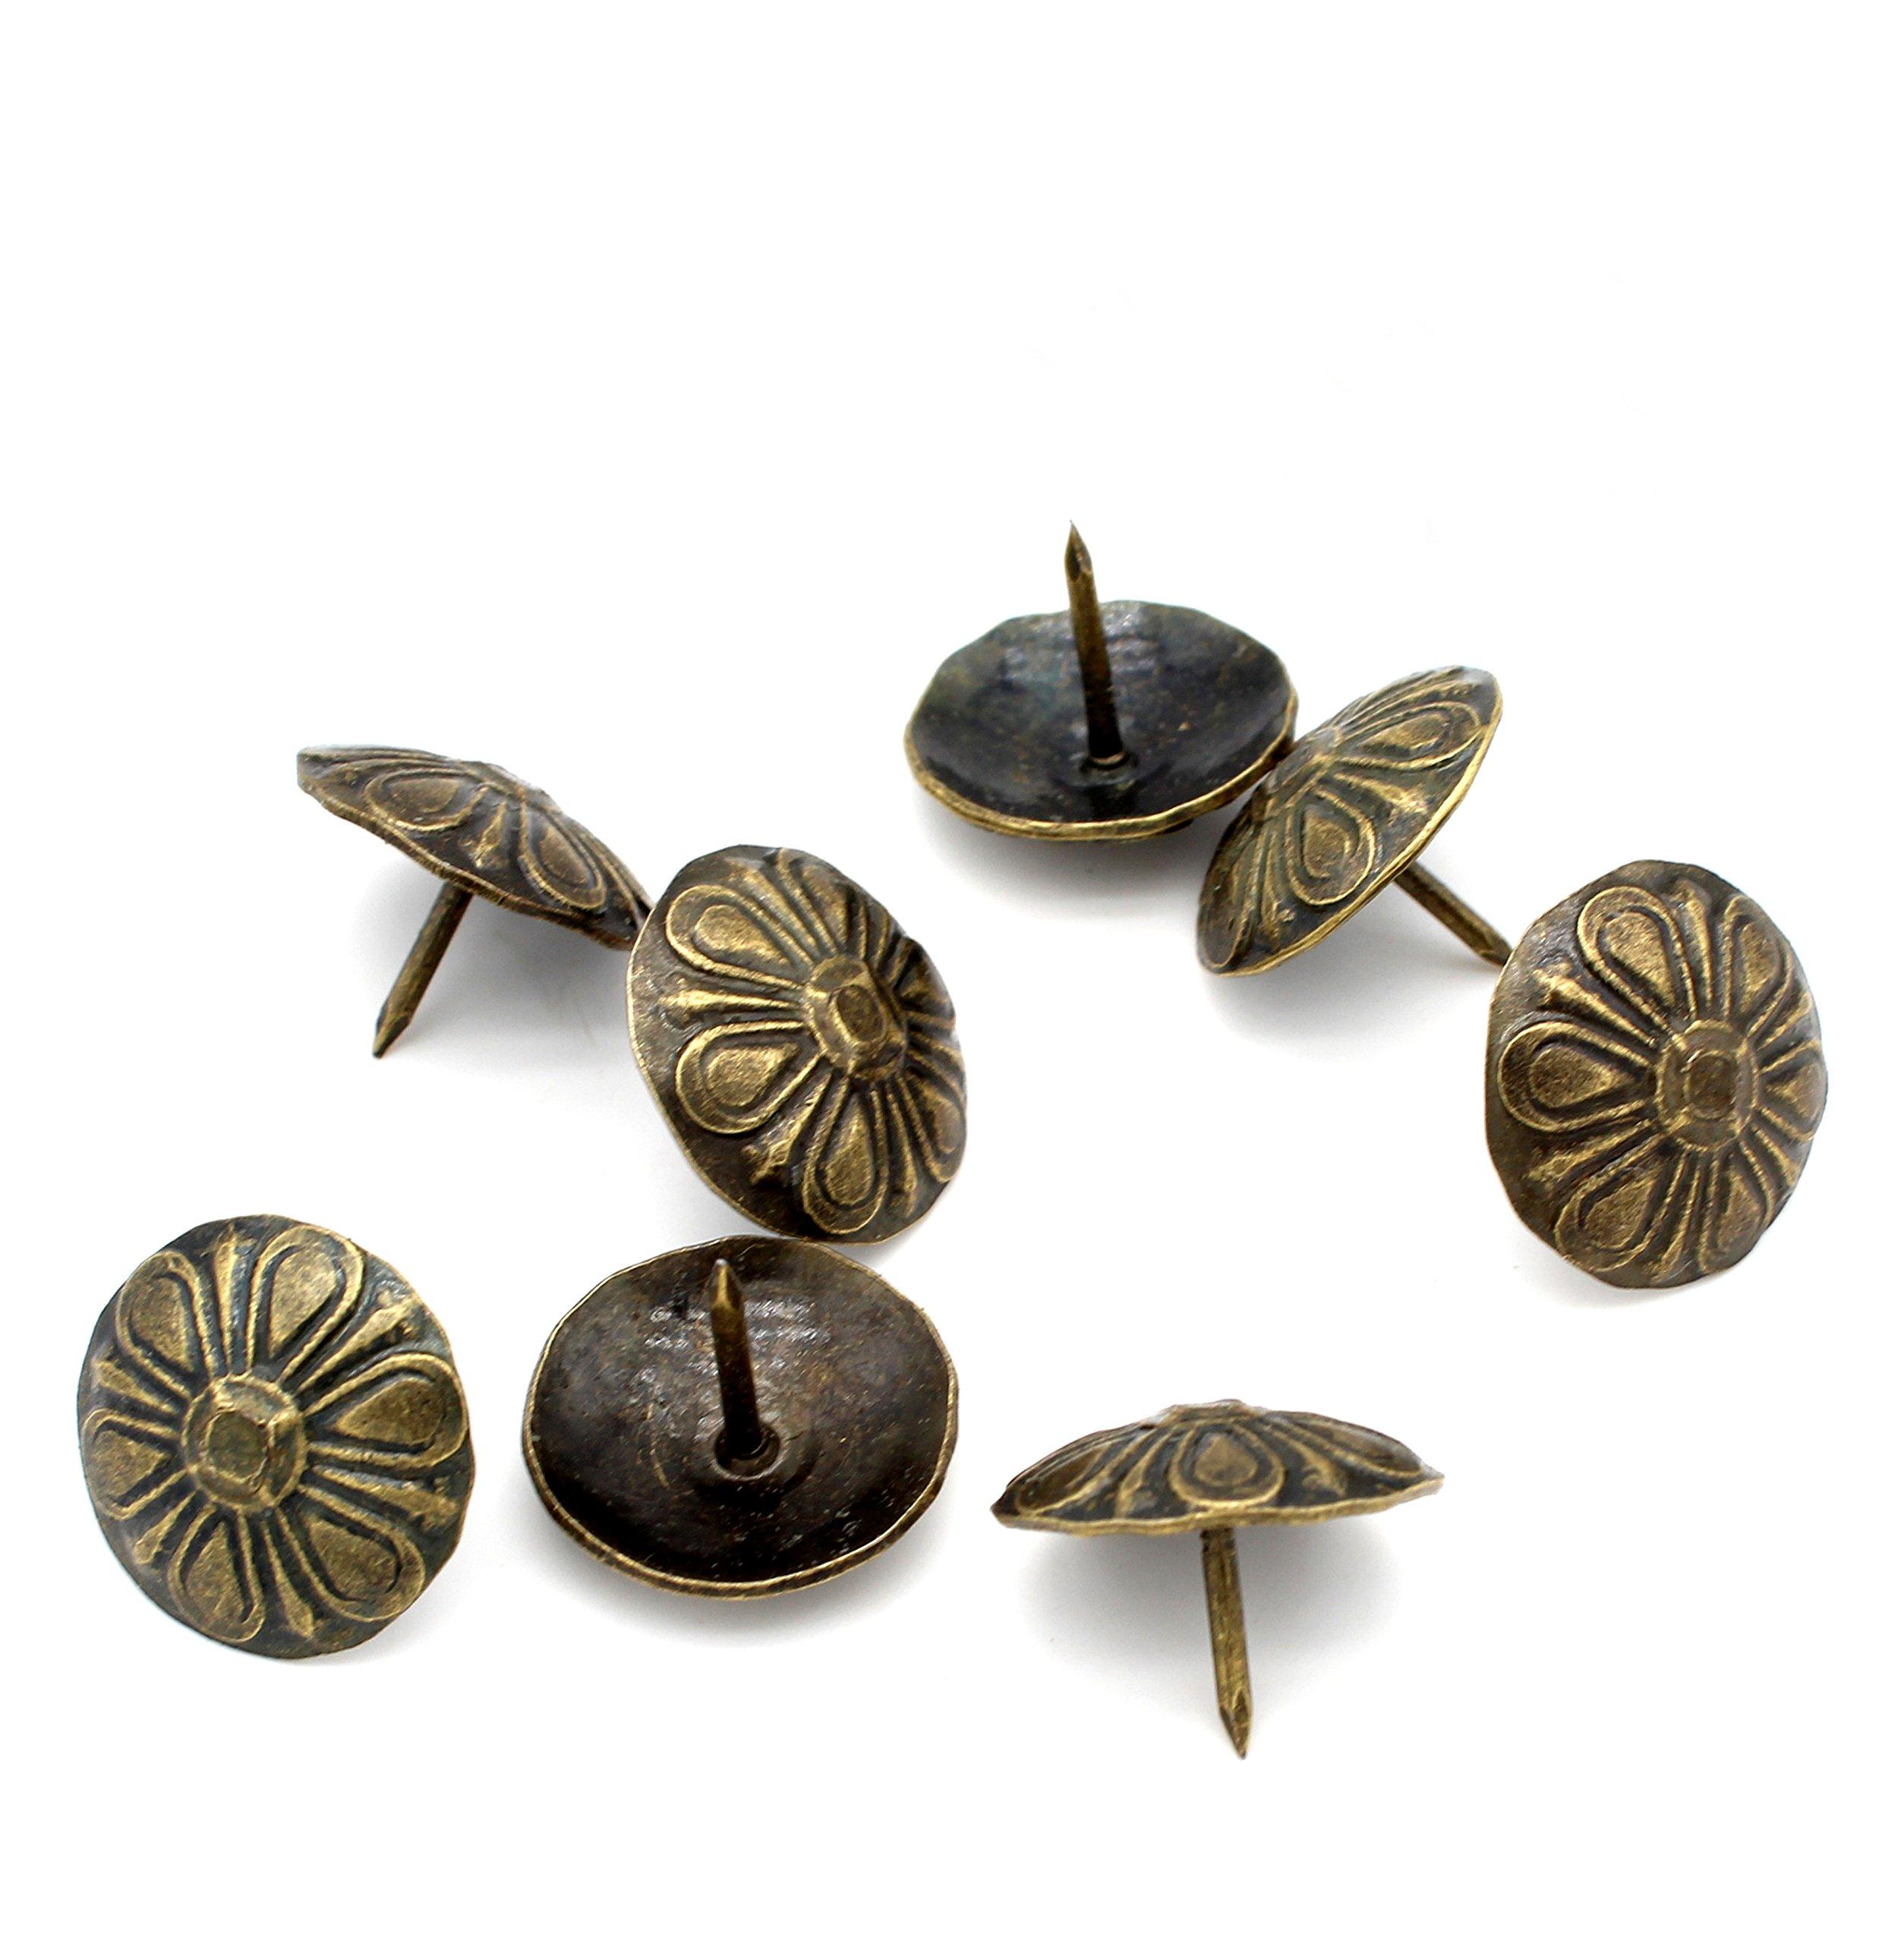 Castuvy Antique Bronze Chrysanthemum Head Decorative Nails, 0.75''(Head), 0.6''(All Lengths), 100 Pieces